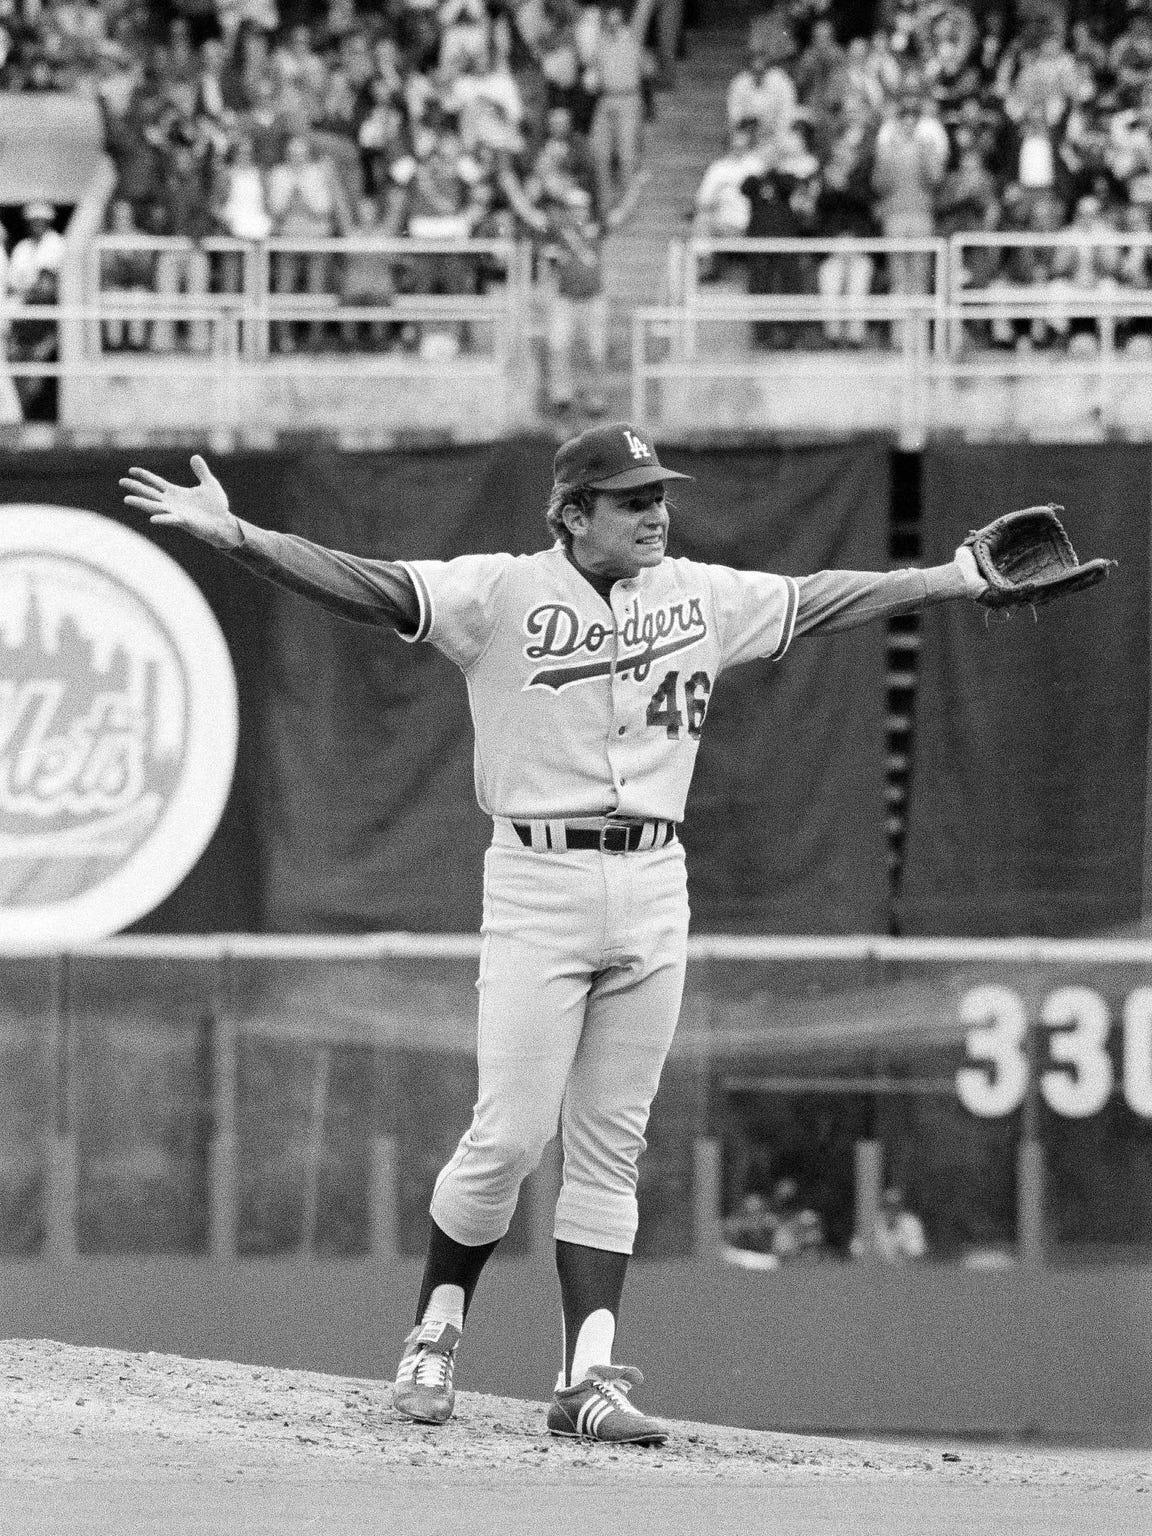 Los Angeles Dodgers' pitcher Burt Hooton throws up